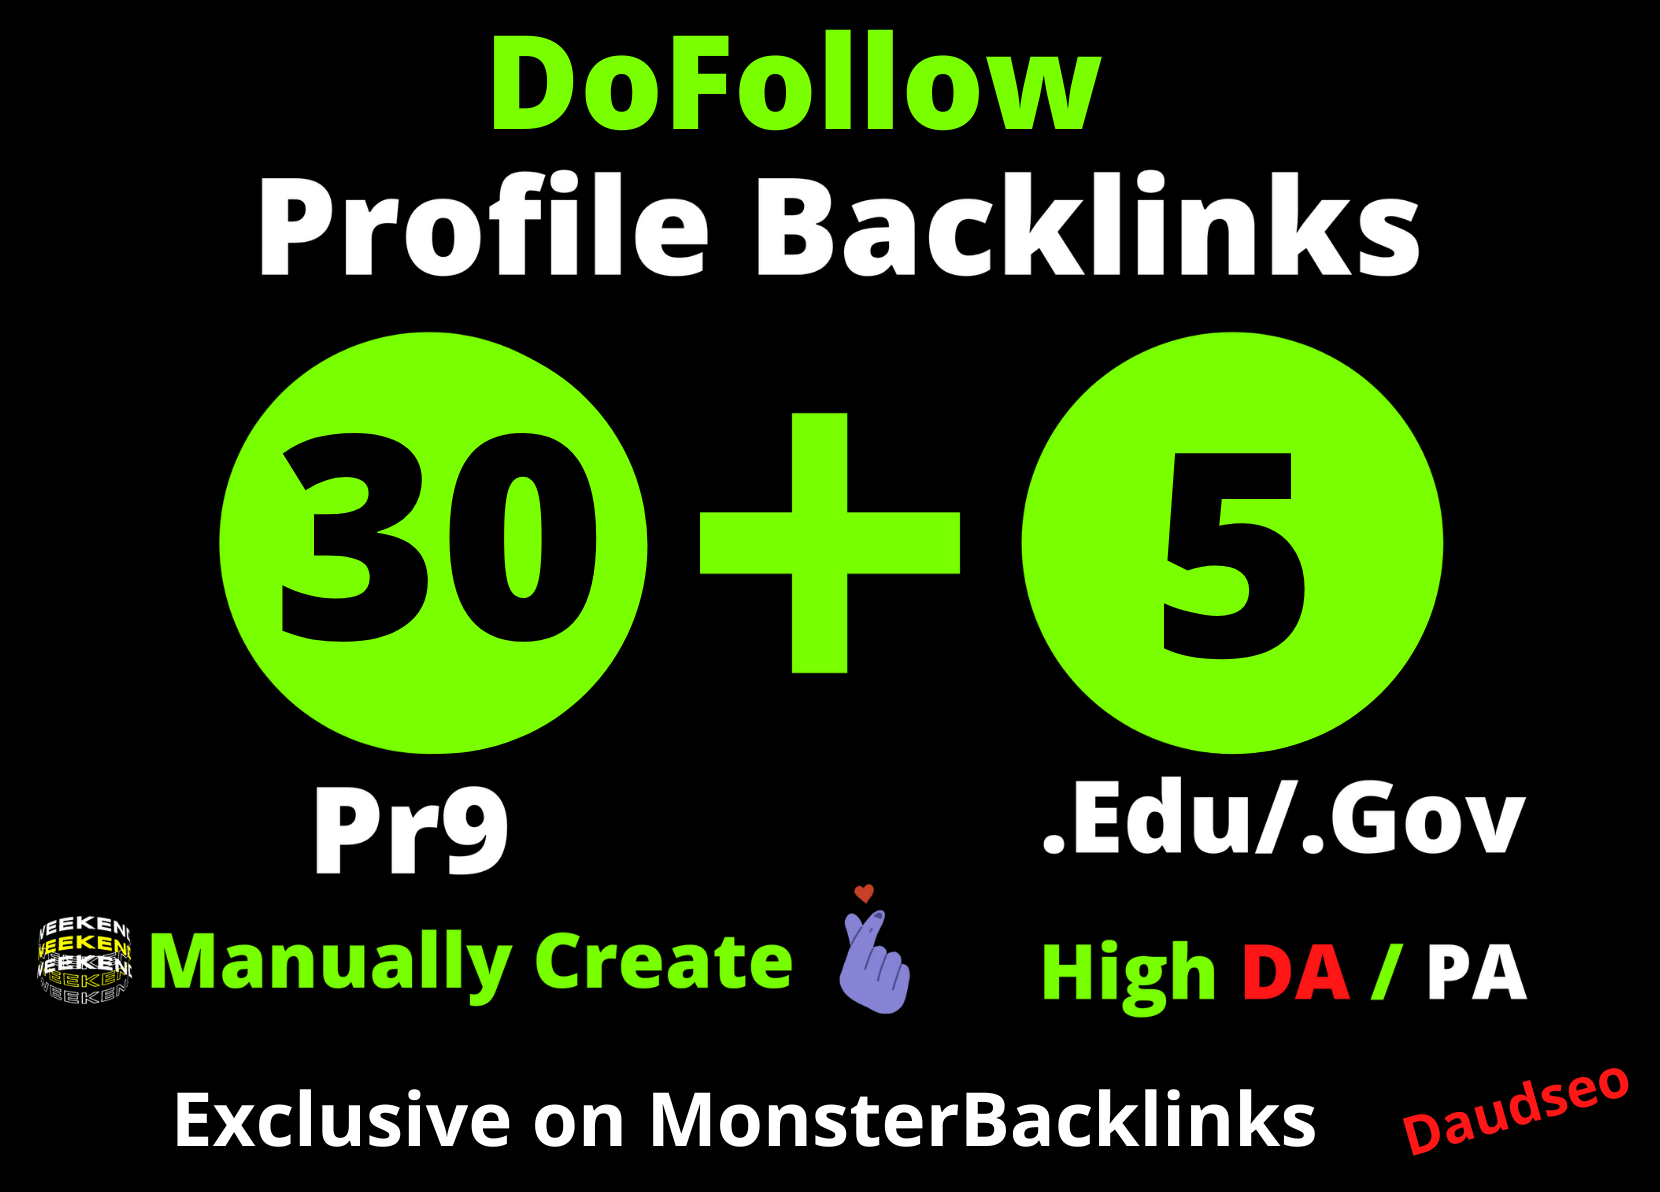 I will Create 30 Pr9 + 5 Edu/Gov Dofollow DA 90+ SEO profile backlinks